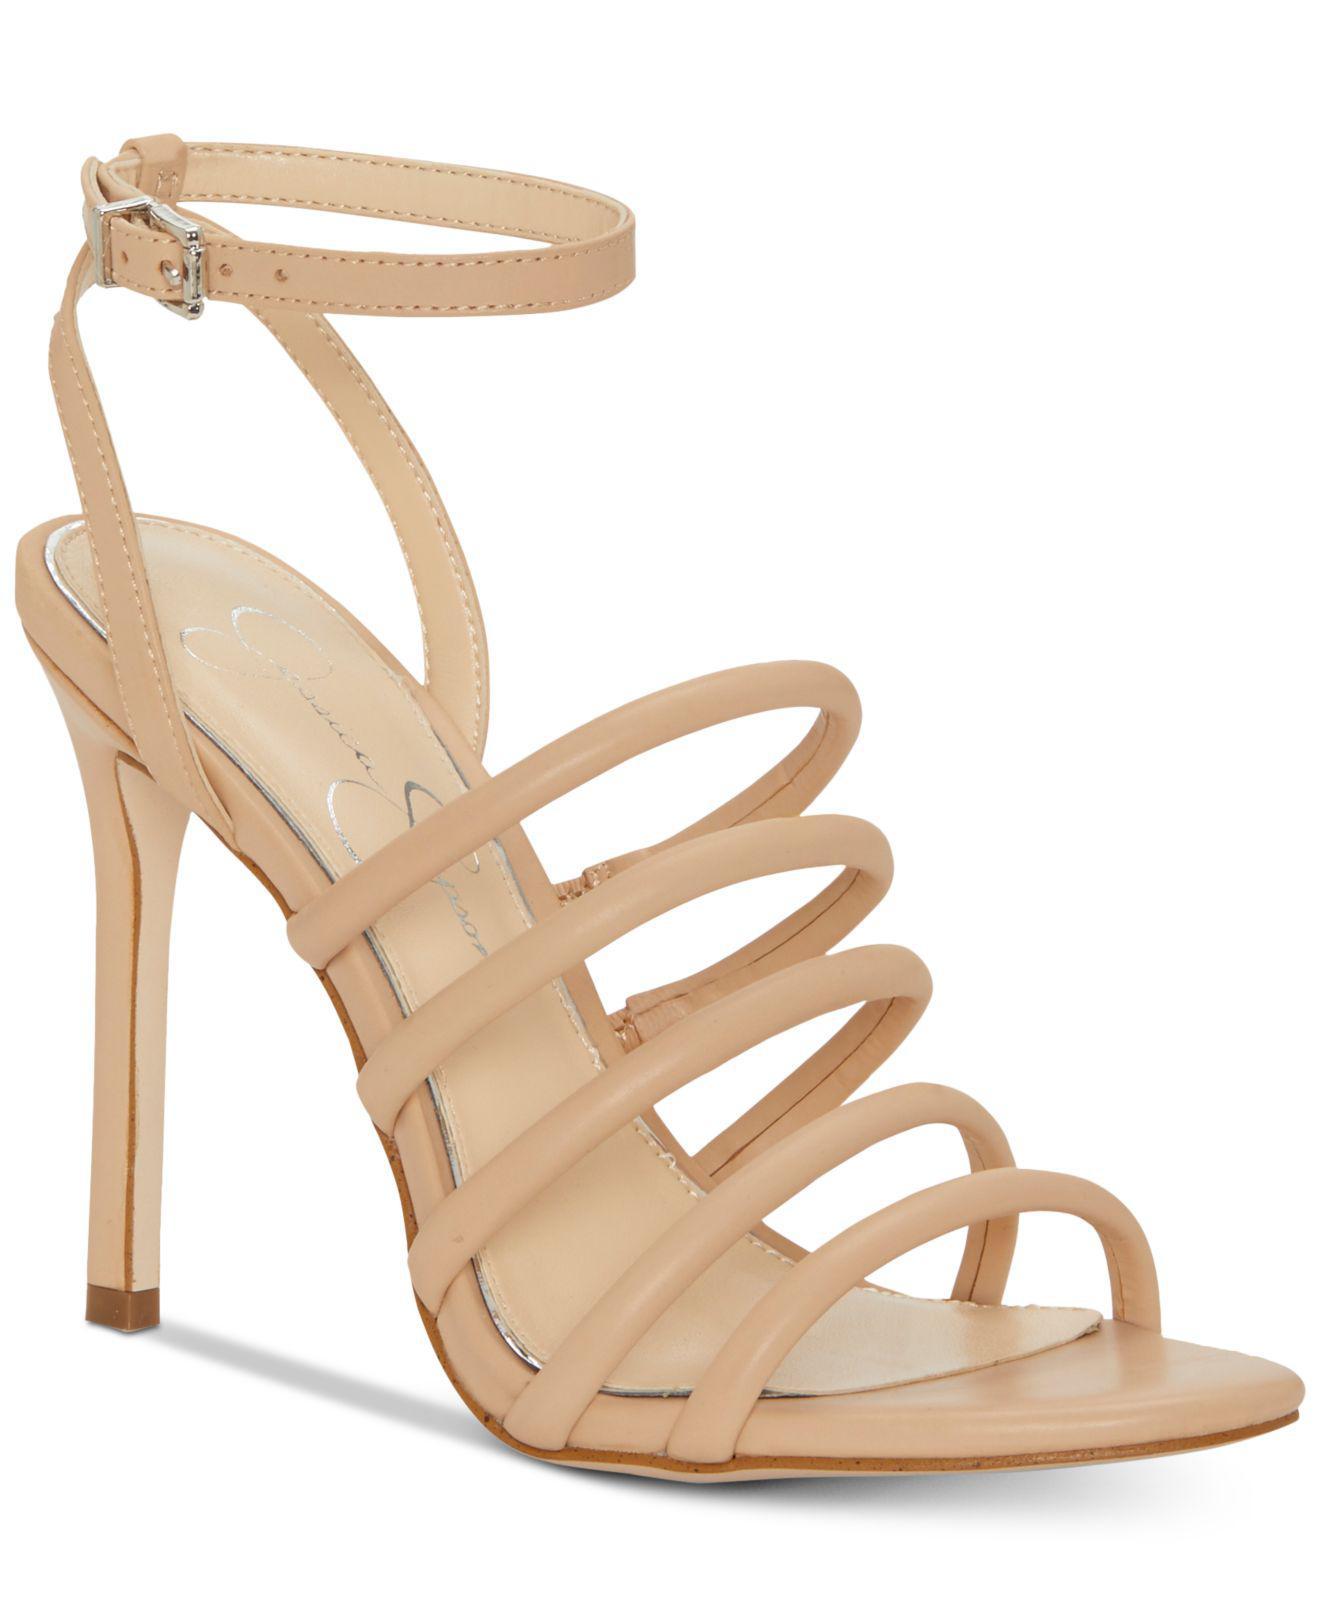 Jessica Simpson Joselle Strappy Sandals H3uduWj